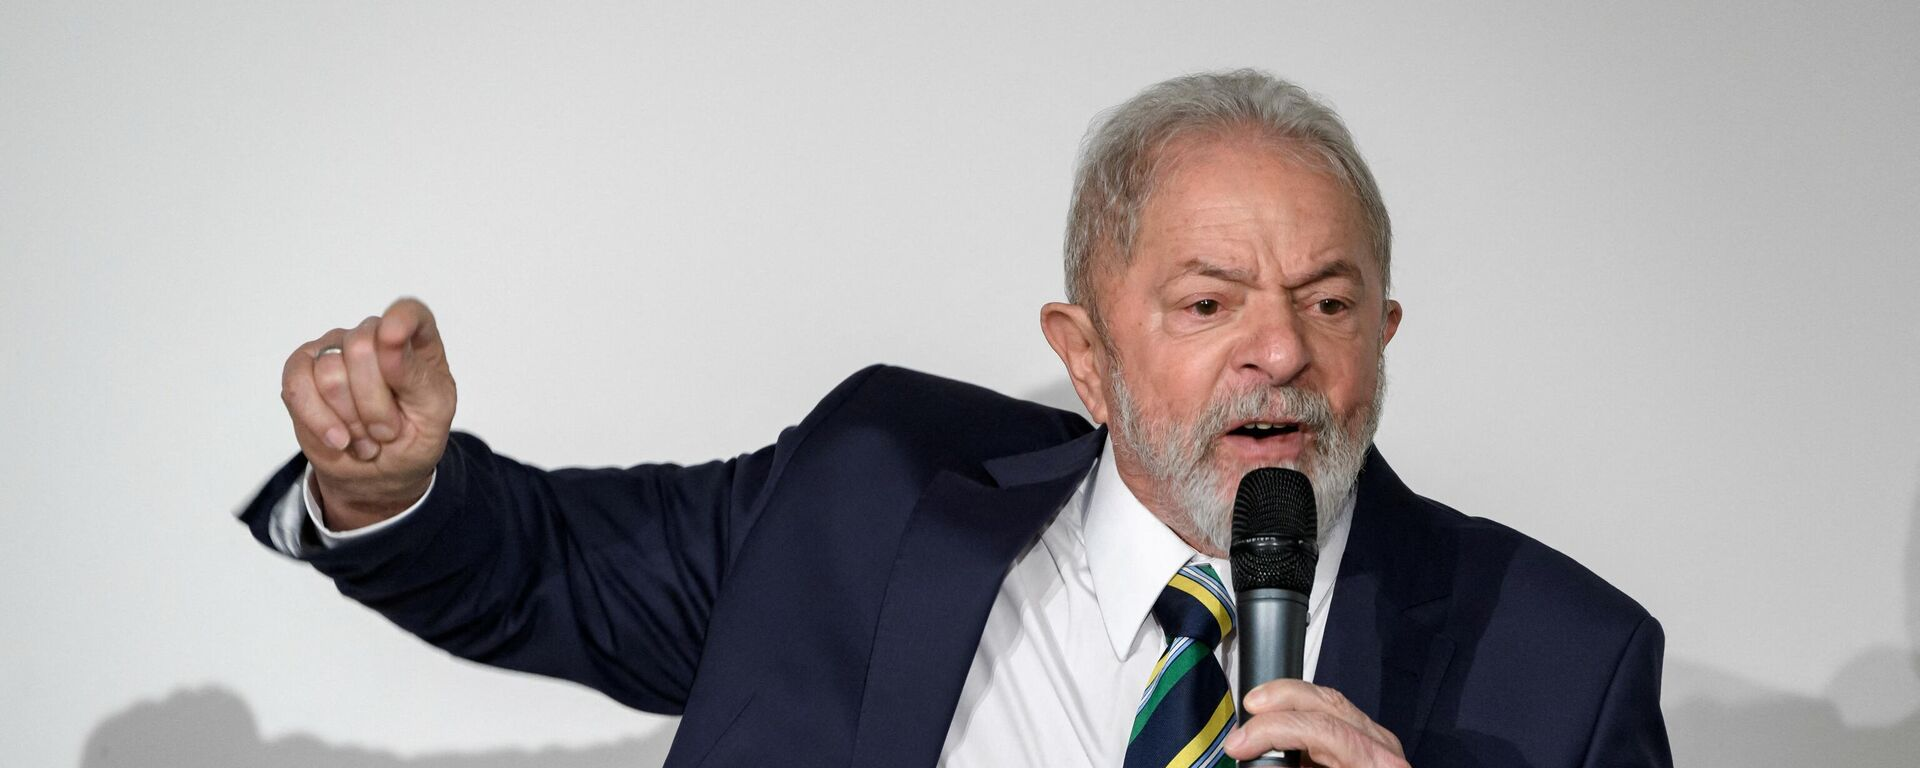 Luiz Inácio Lula da Silva , expresidente de Brasil - Sputnik Mundo, 1920, 20.07.2021